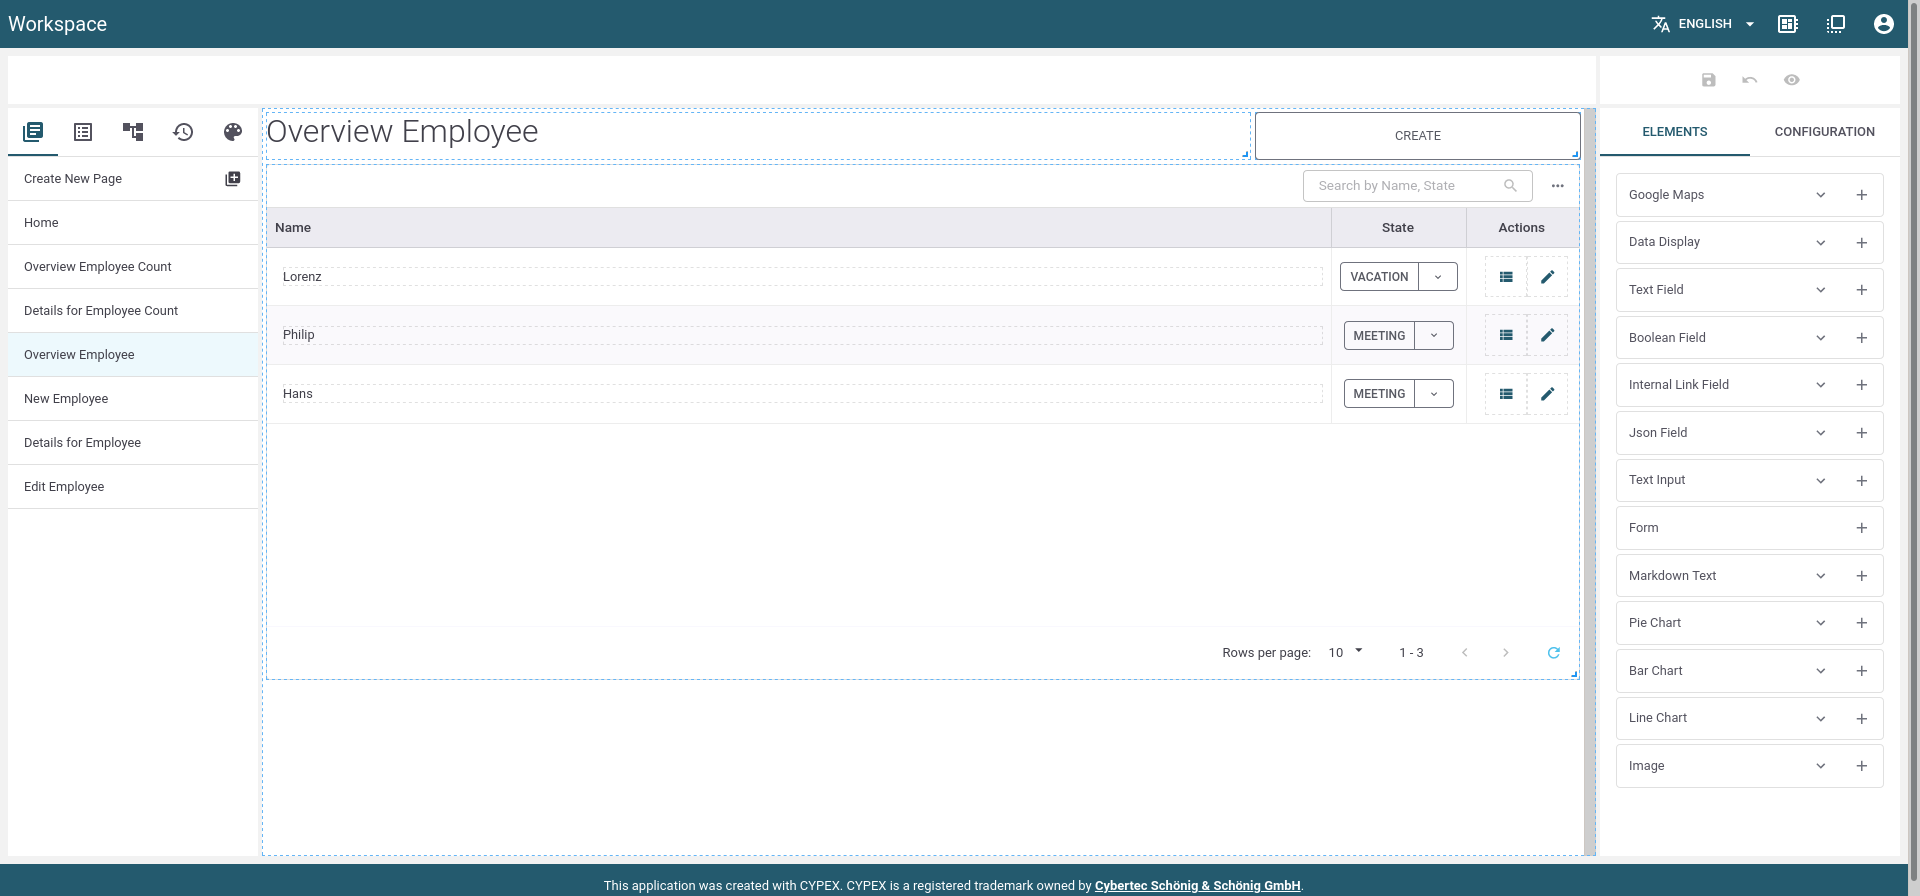 CYPEX: GUI Editor Mode